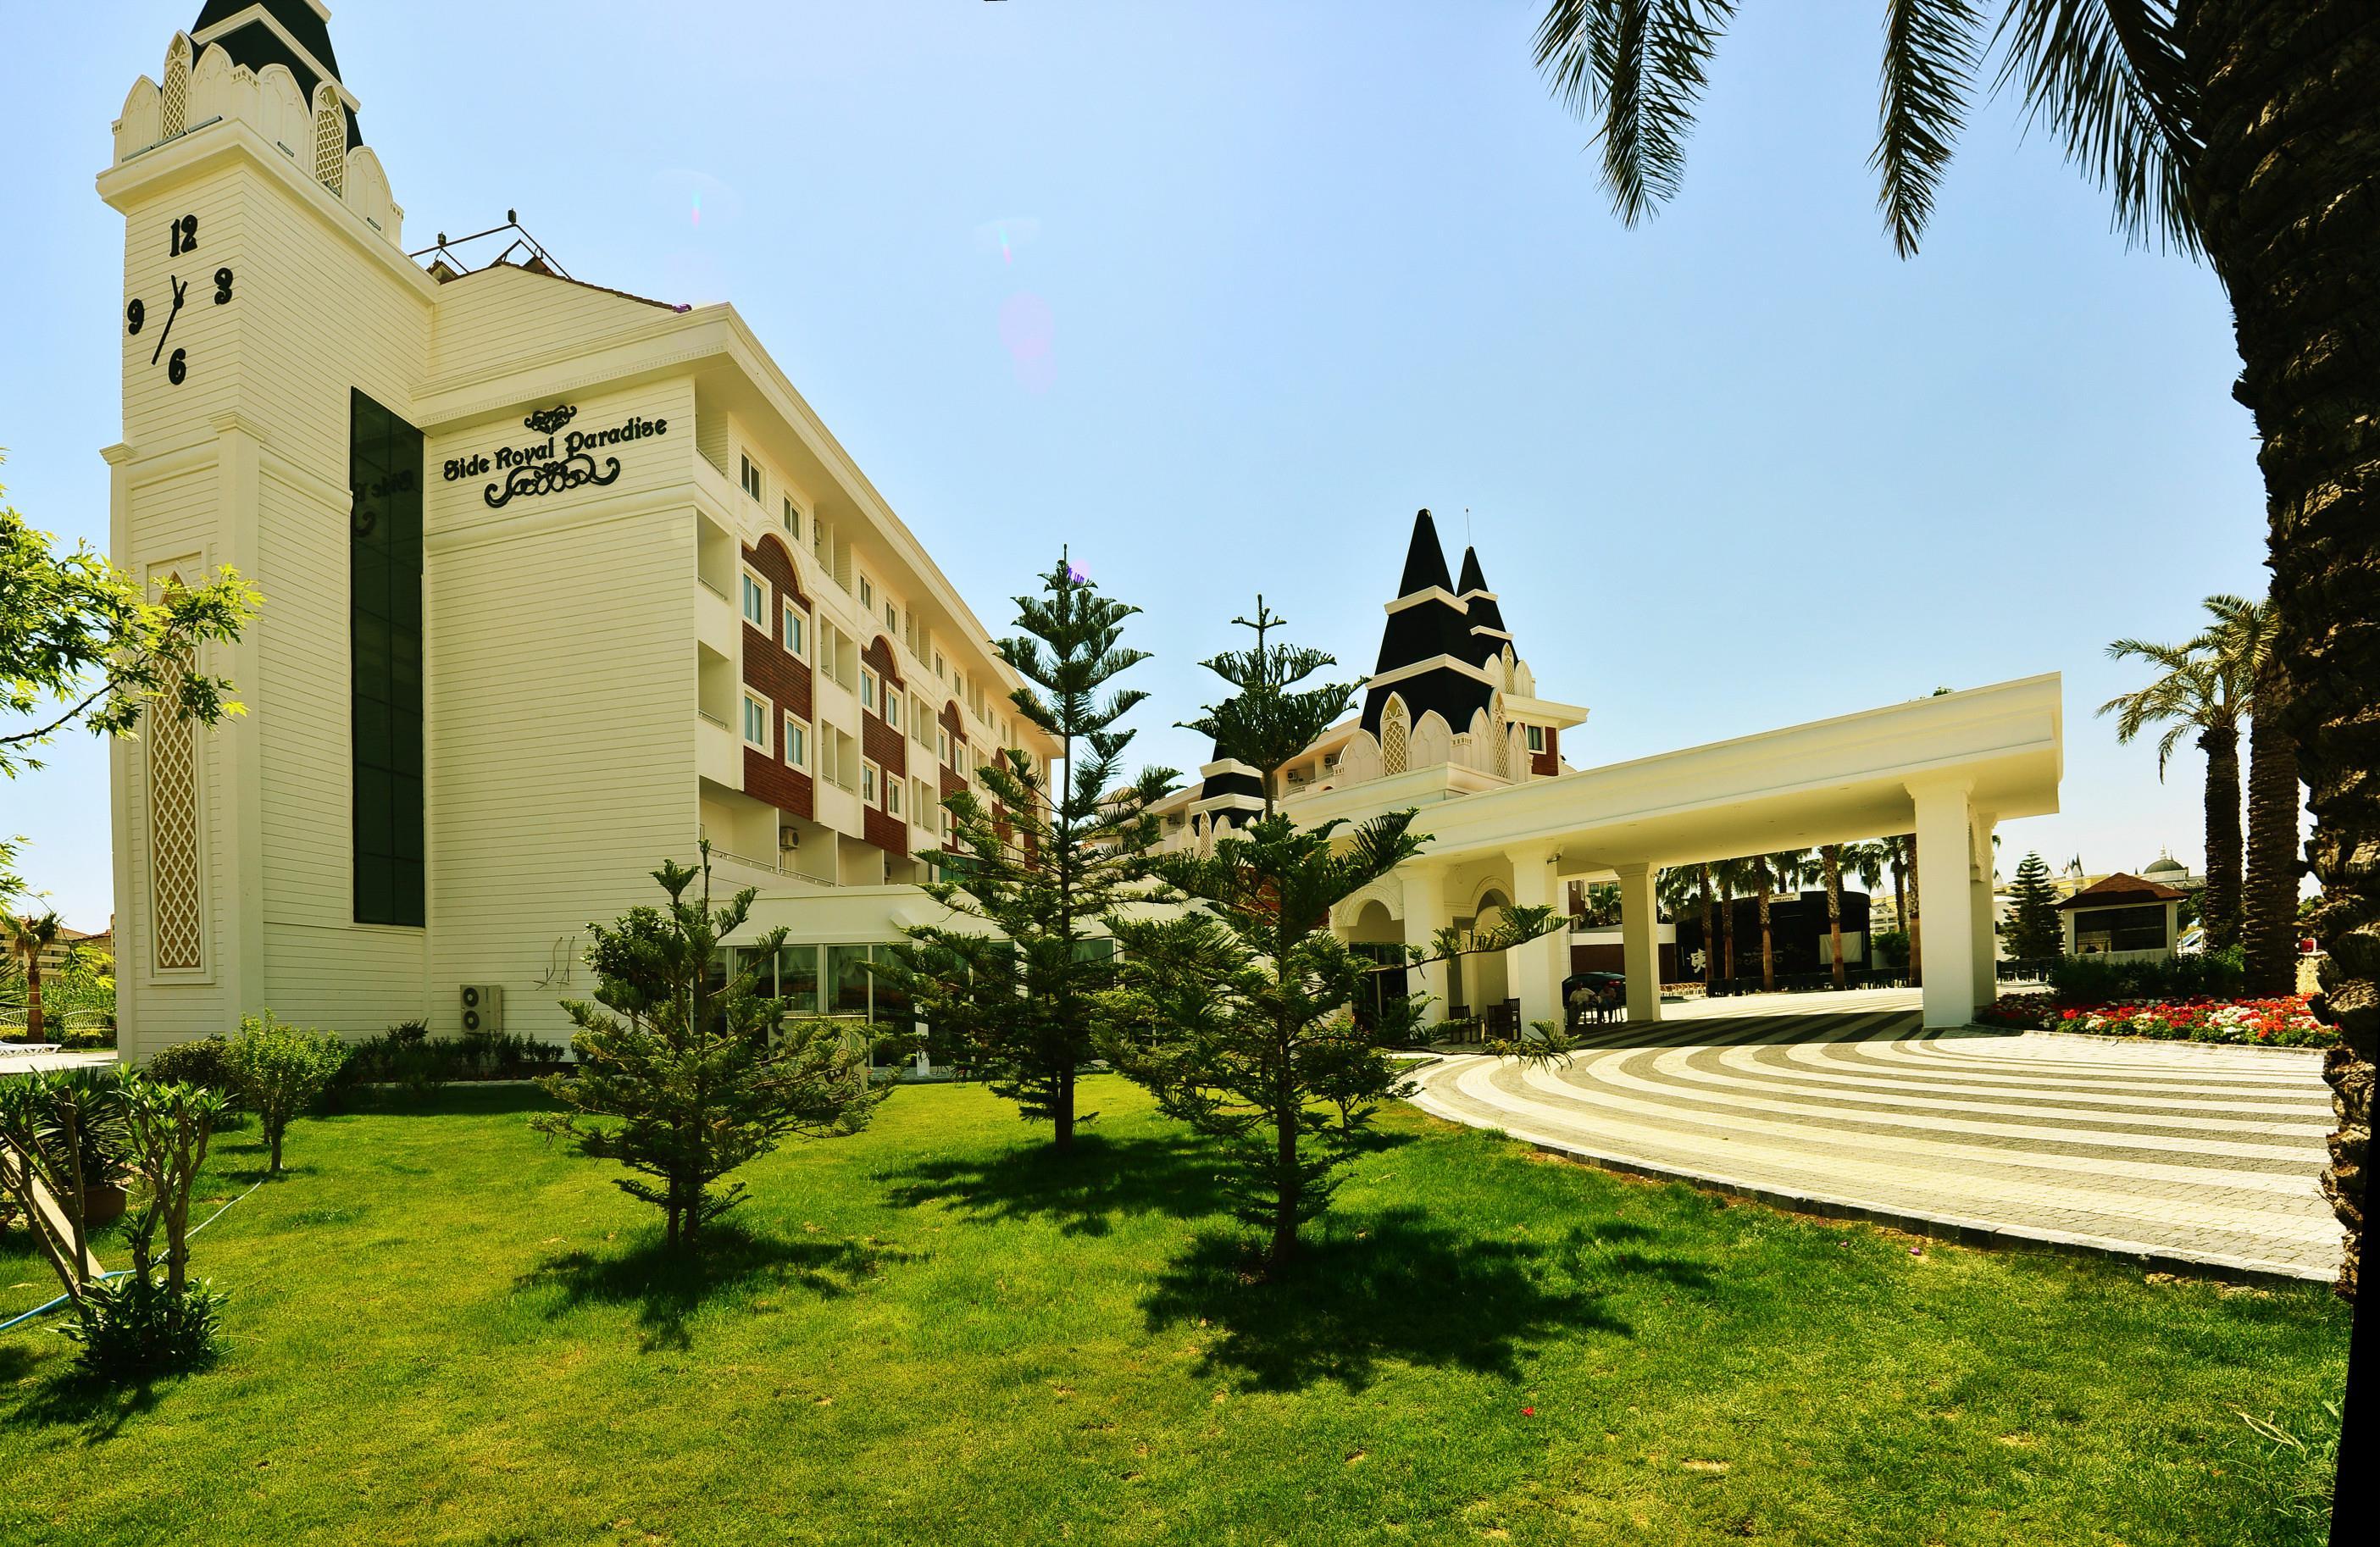 http://www.orextravel.sk/OREX/hotelphotos/side-royal-paradise-general-002.jpg